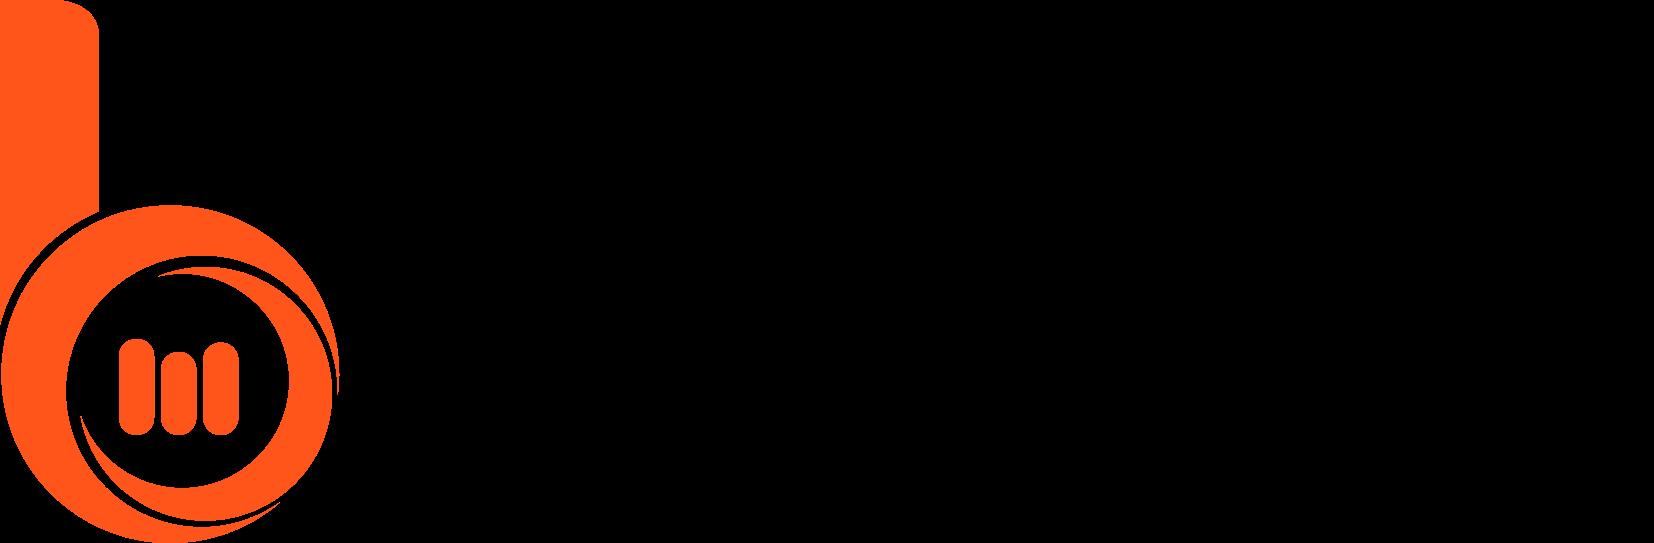 Berlsoft GmbH